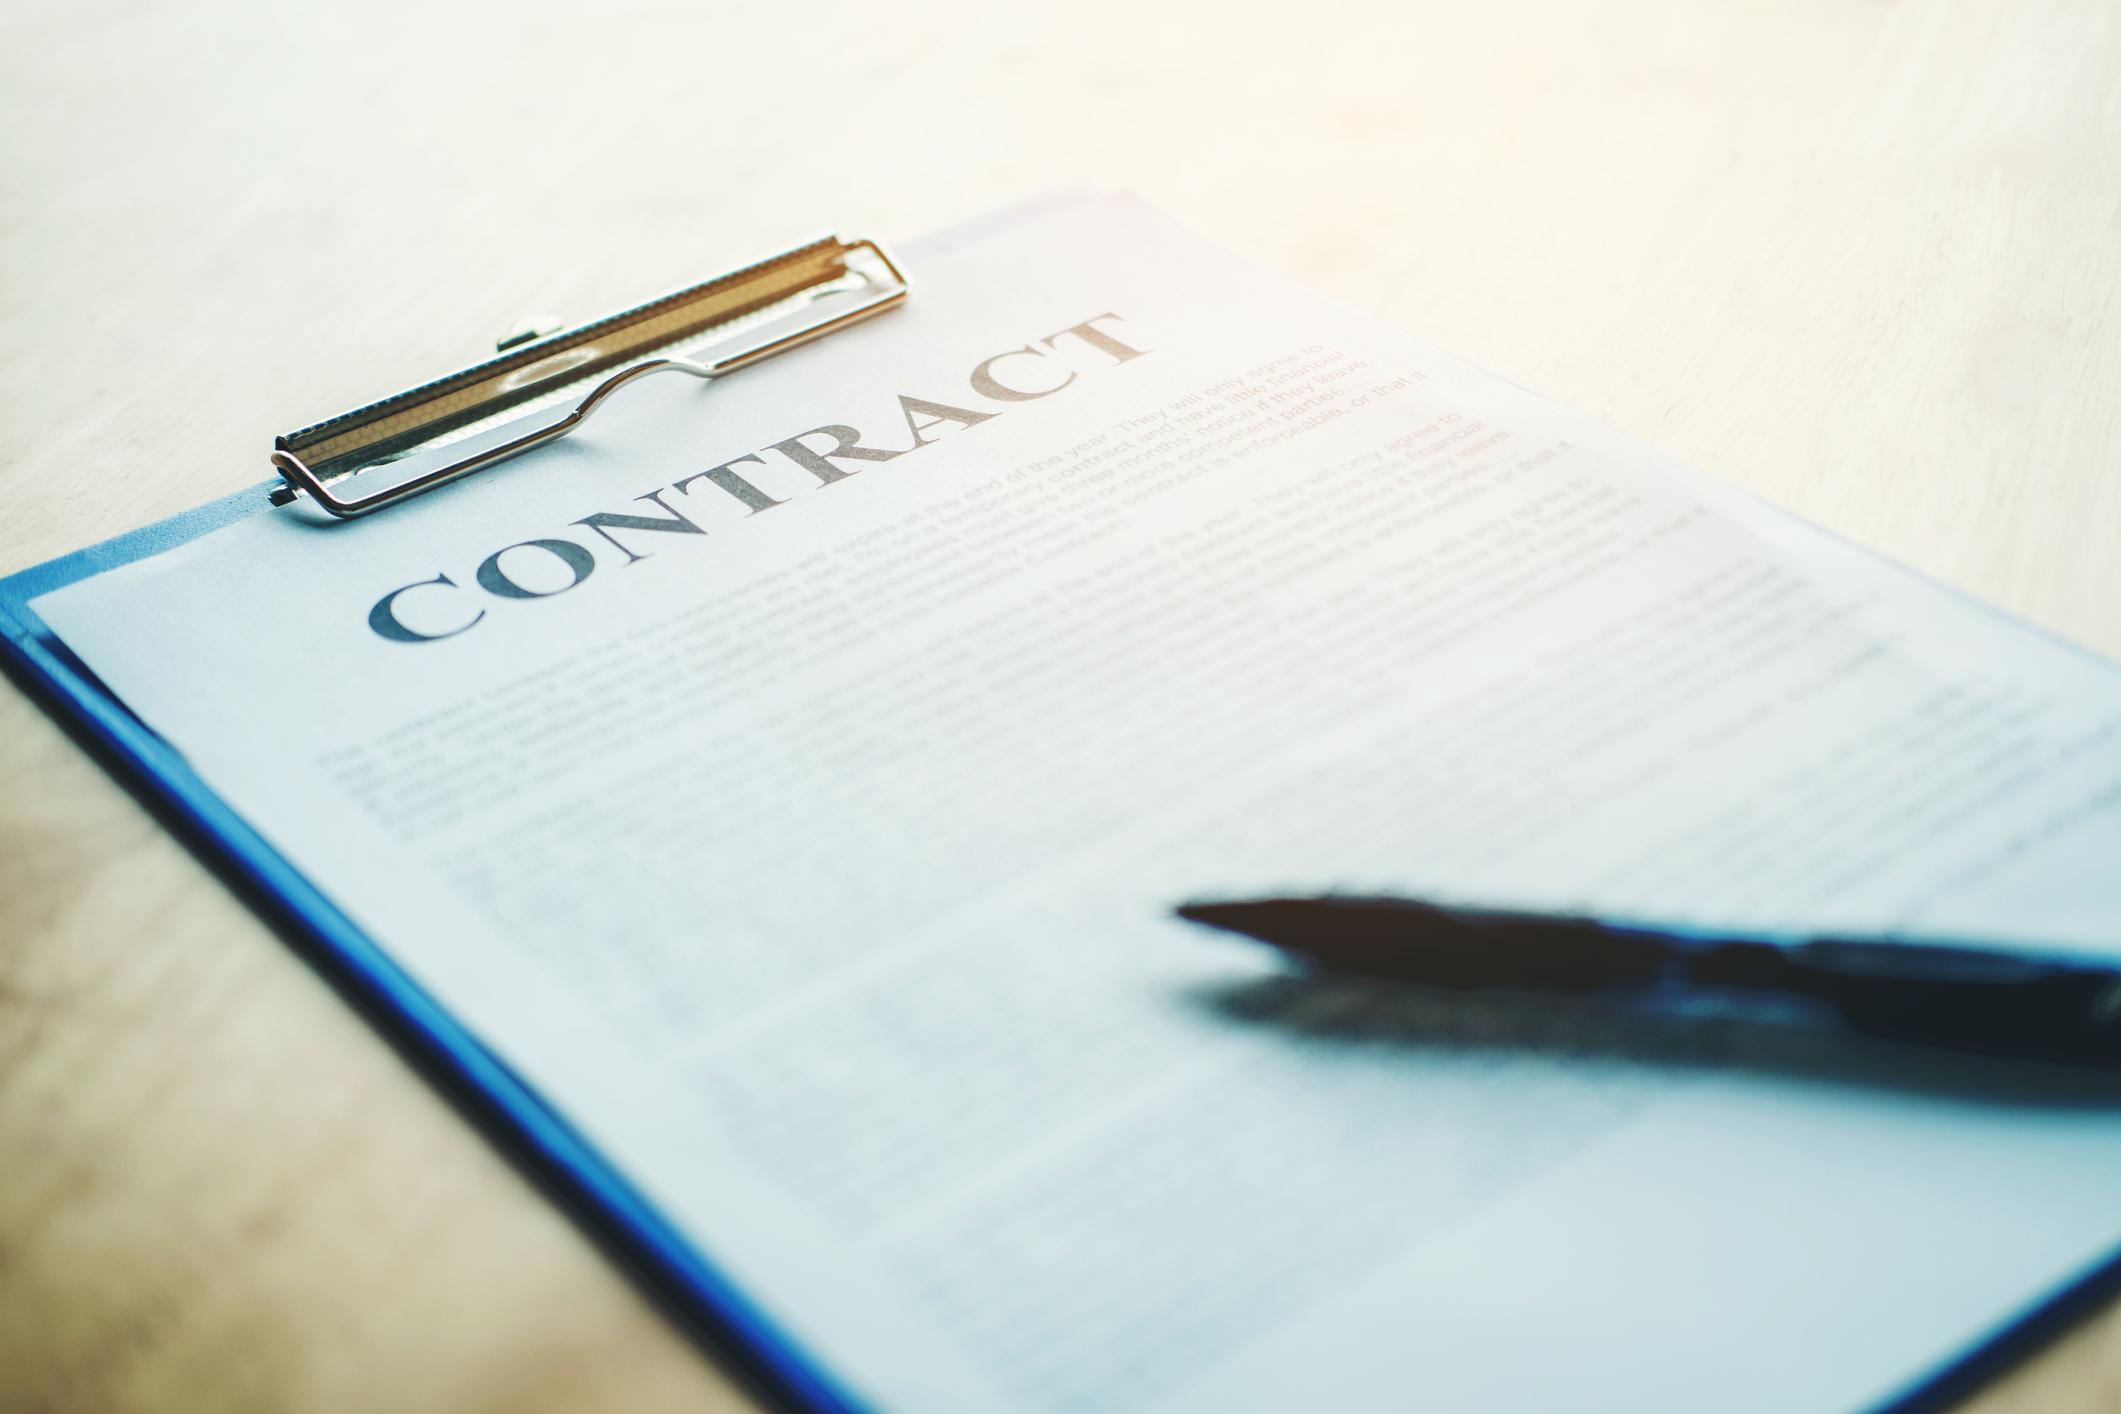 Contract_iStock-919426172.jpg